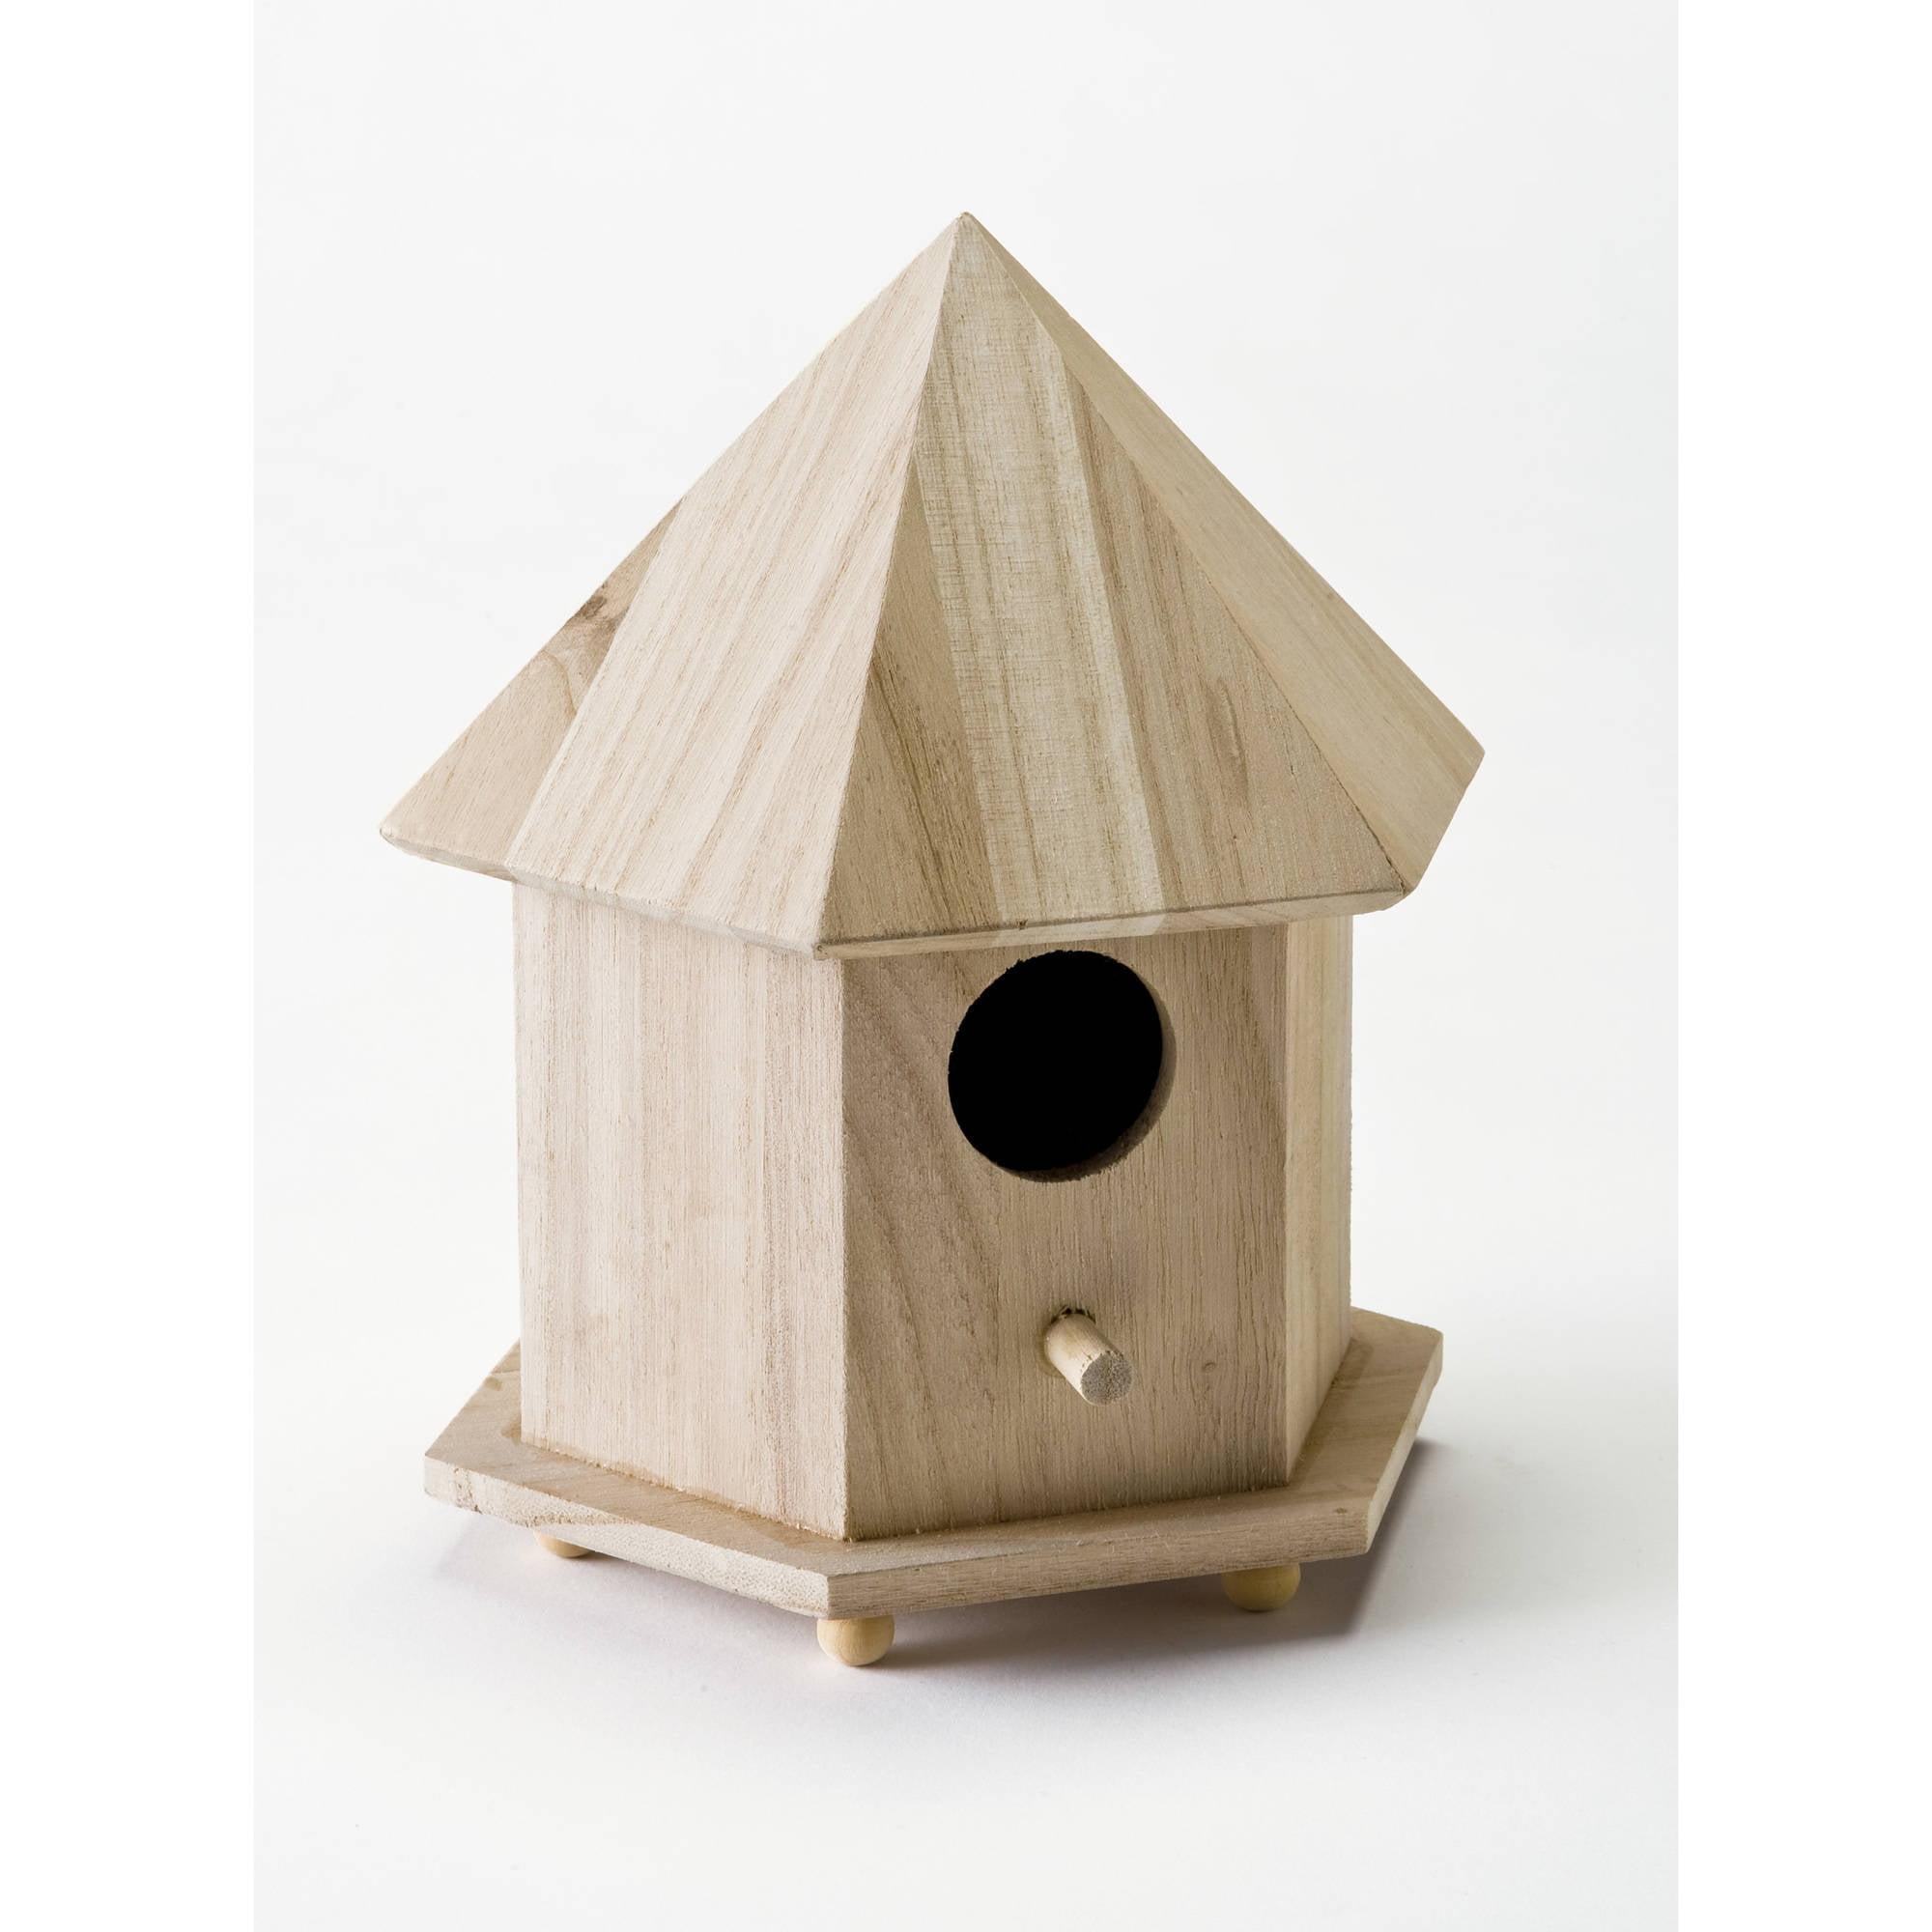 Plaid Wood Surfaces Gazebo Birdhouse, 1 Each